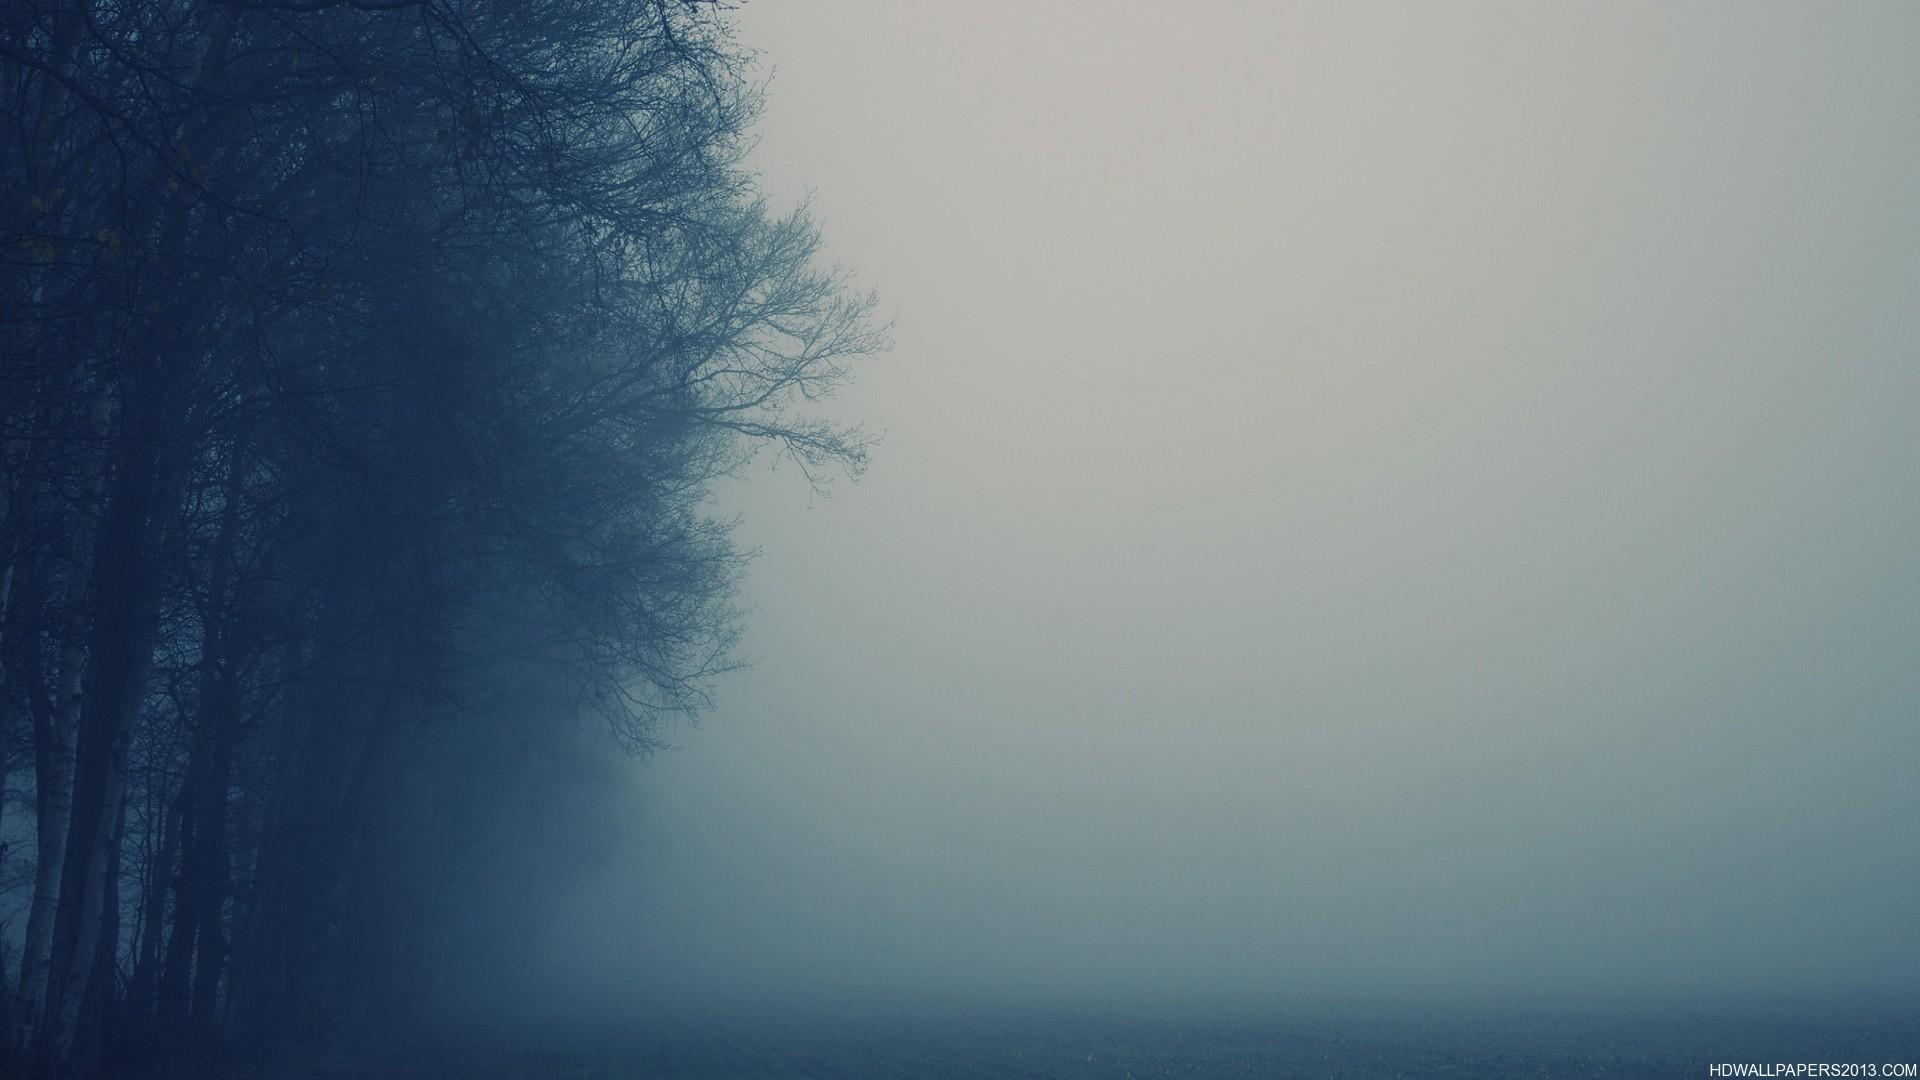 Fog Wallpapers HD - WallpaperSafari Dark Forest Wallpapers Widescreen